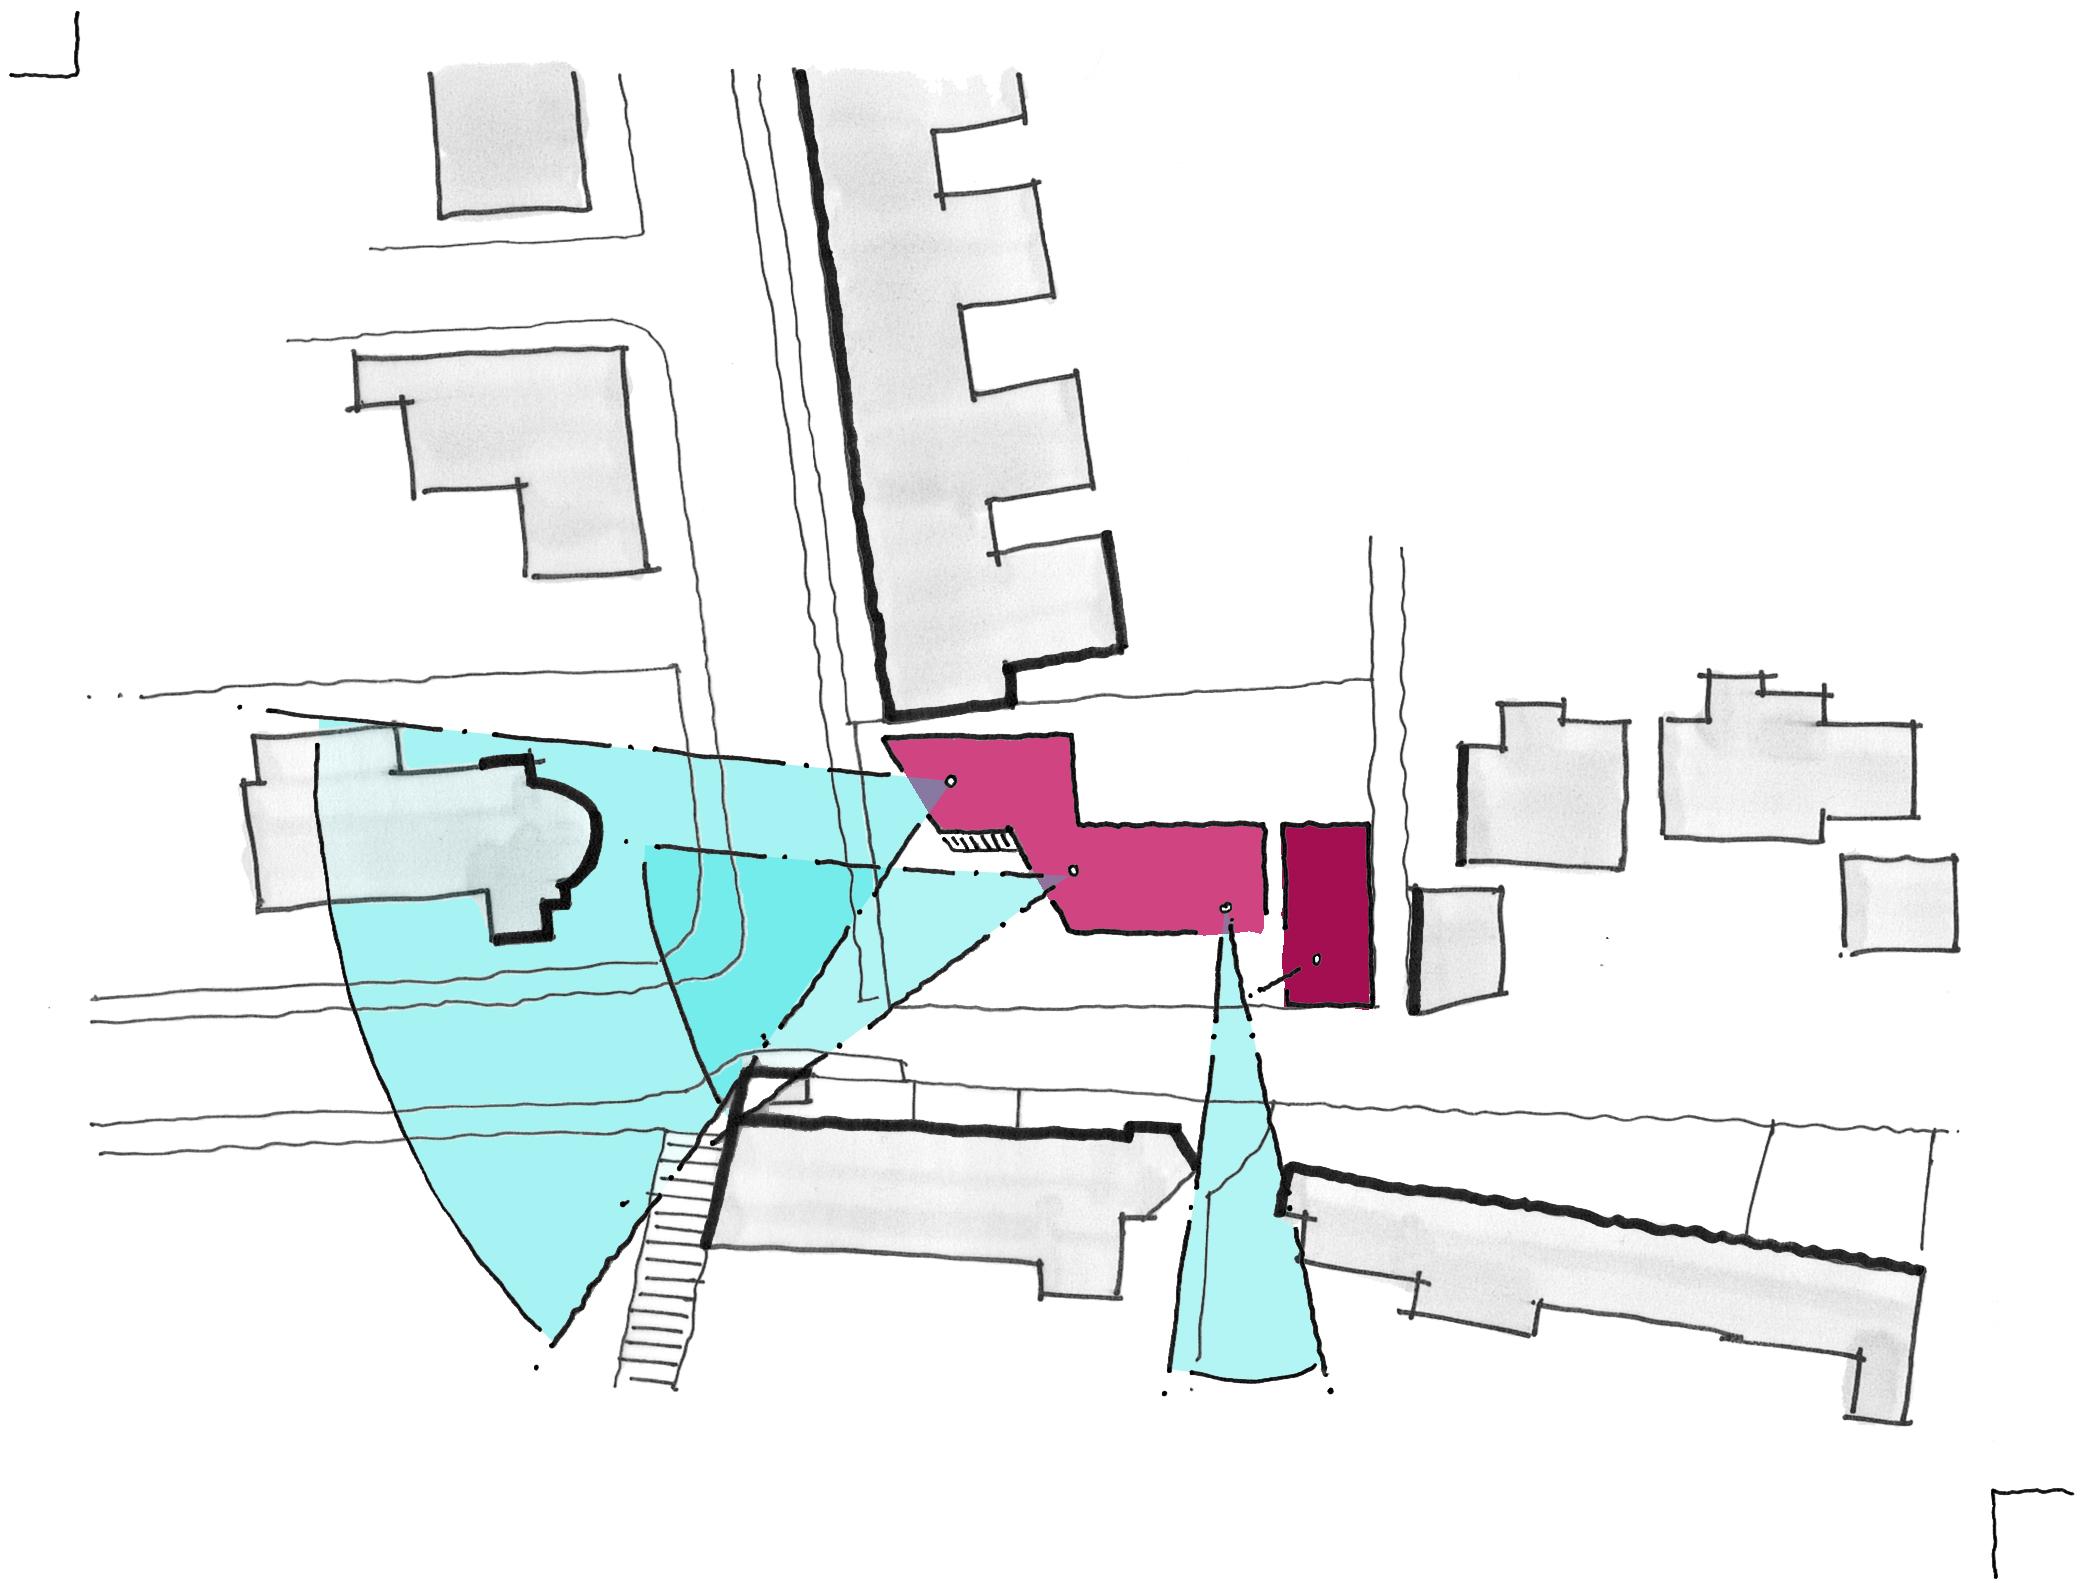 SK_Diagram_05.jpg